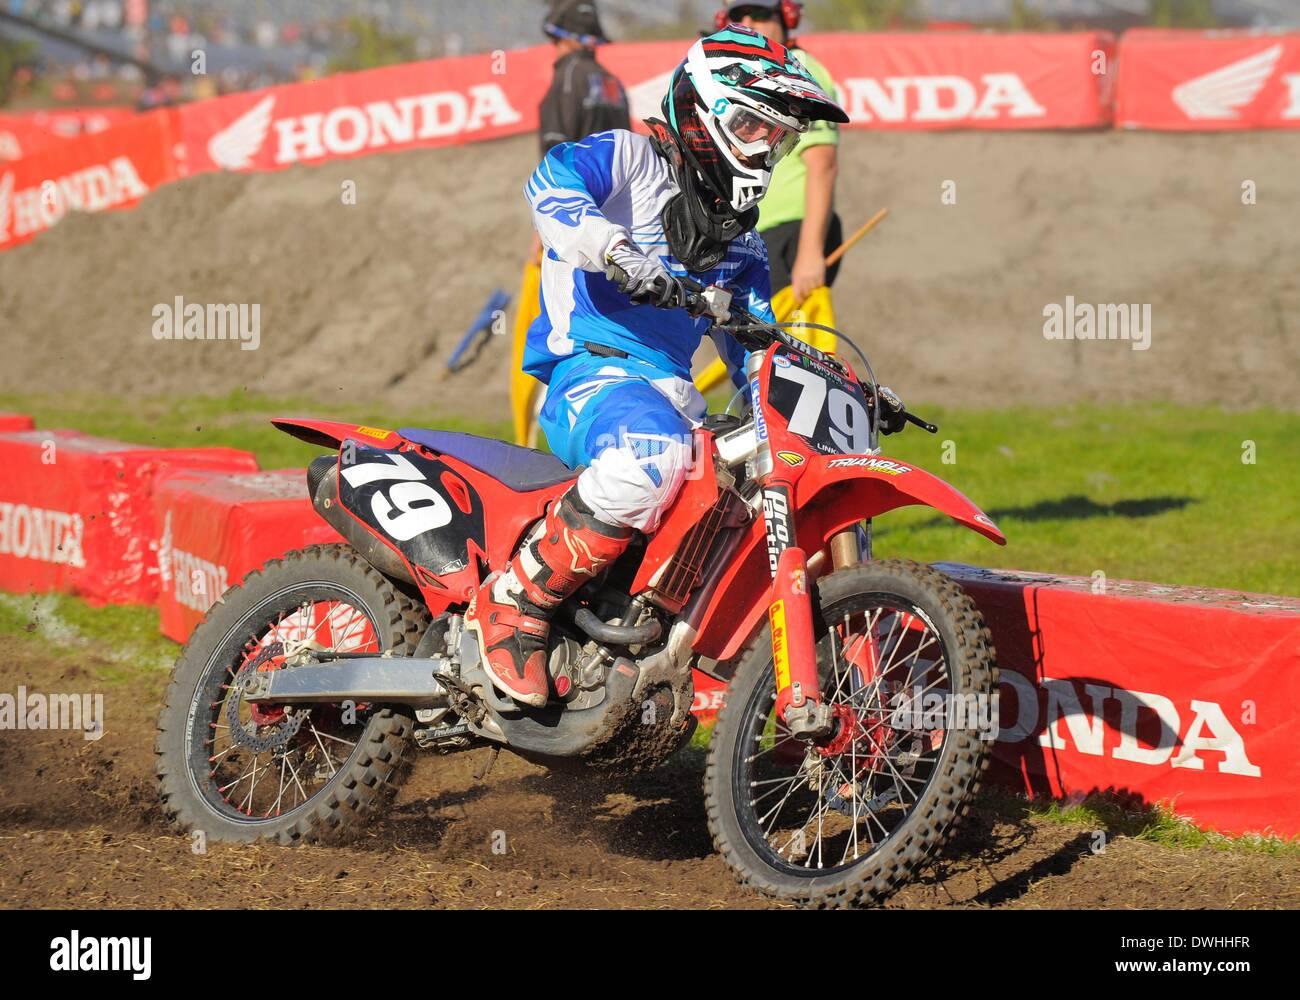 Honda 250 Stock Photos Images Alamy 2014 250cc Dirt Bike 08th Mar Ryan Zimmer 79